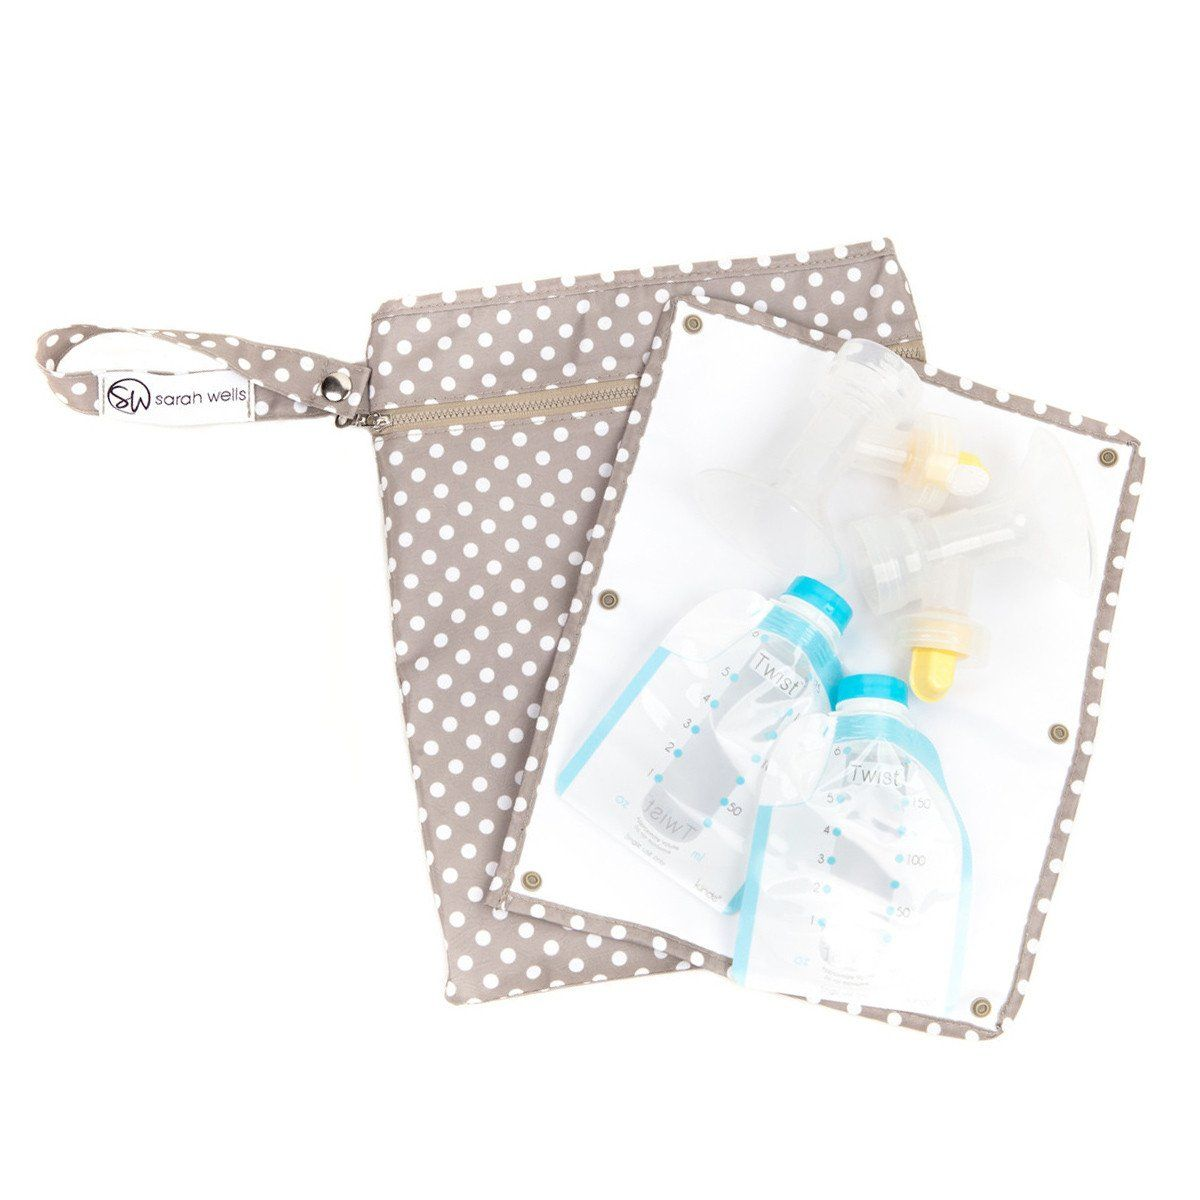 01dbe8d2471a8 Pumparoo (Greige)   Breast Pump Bags   Accessories from Sarah Wells